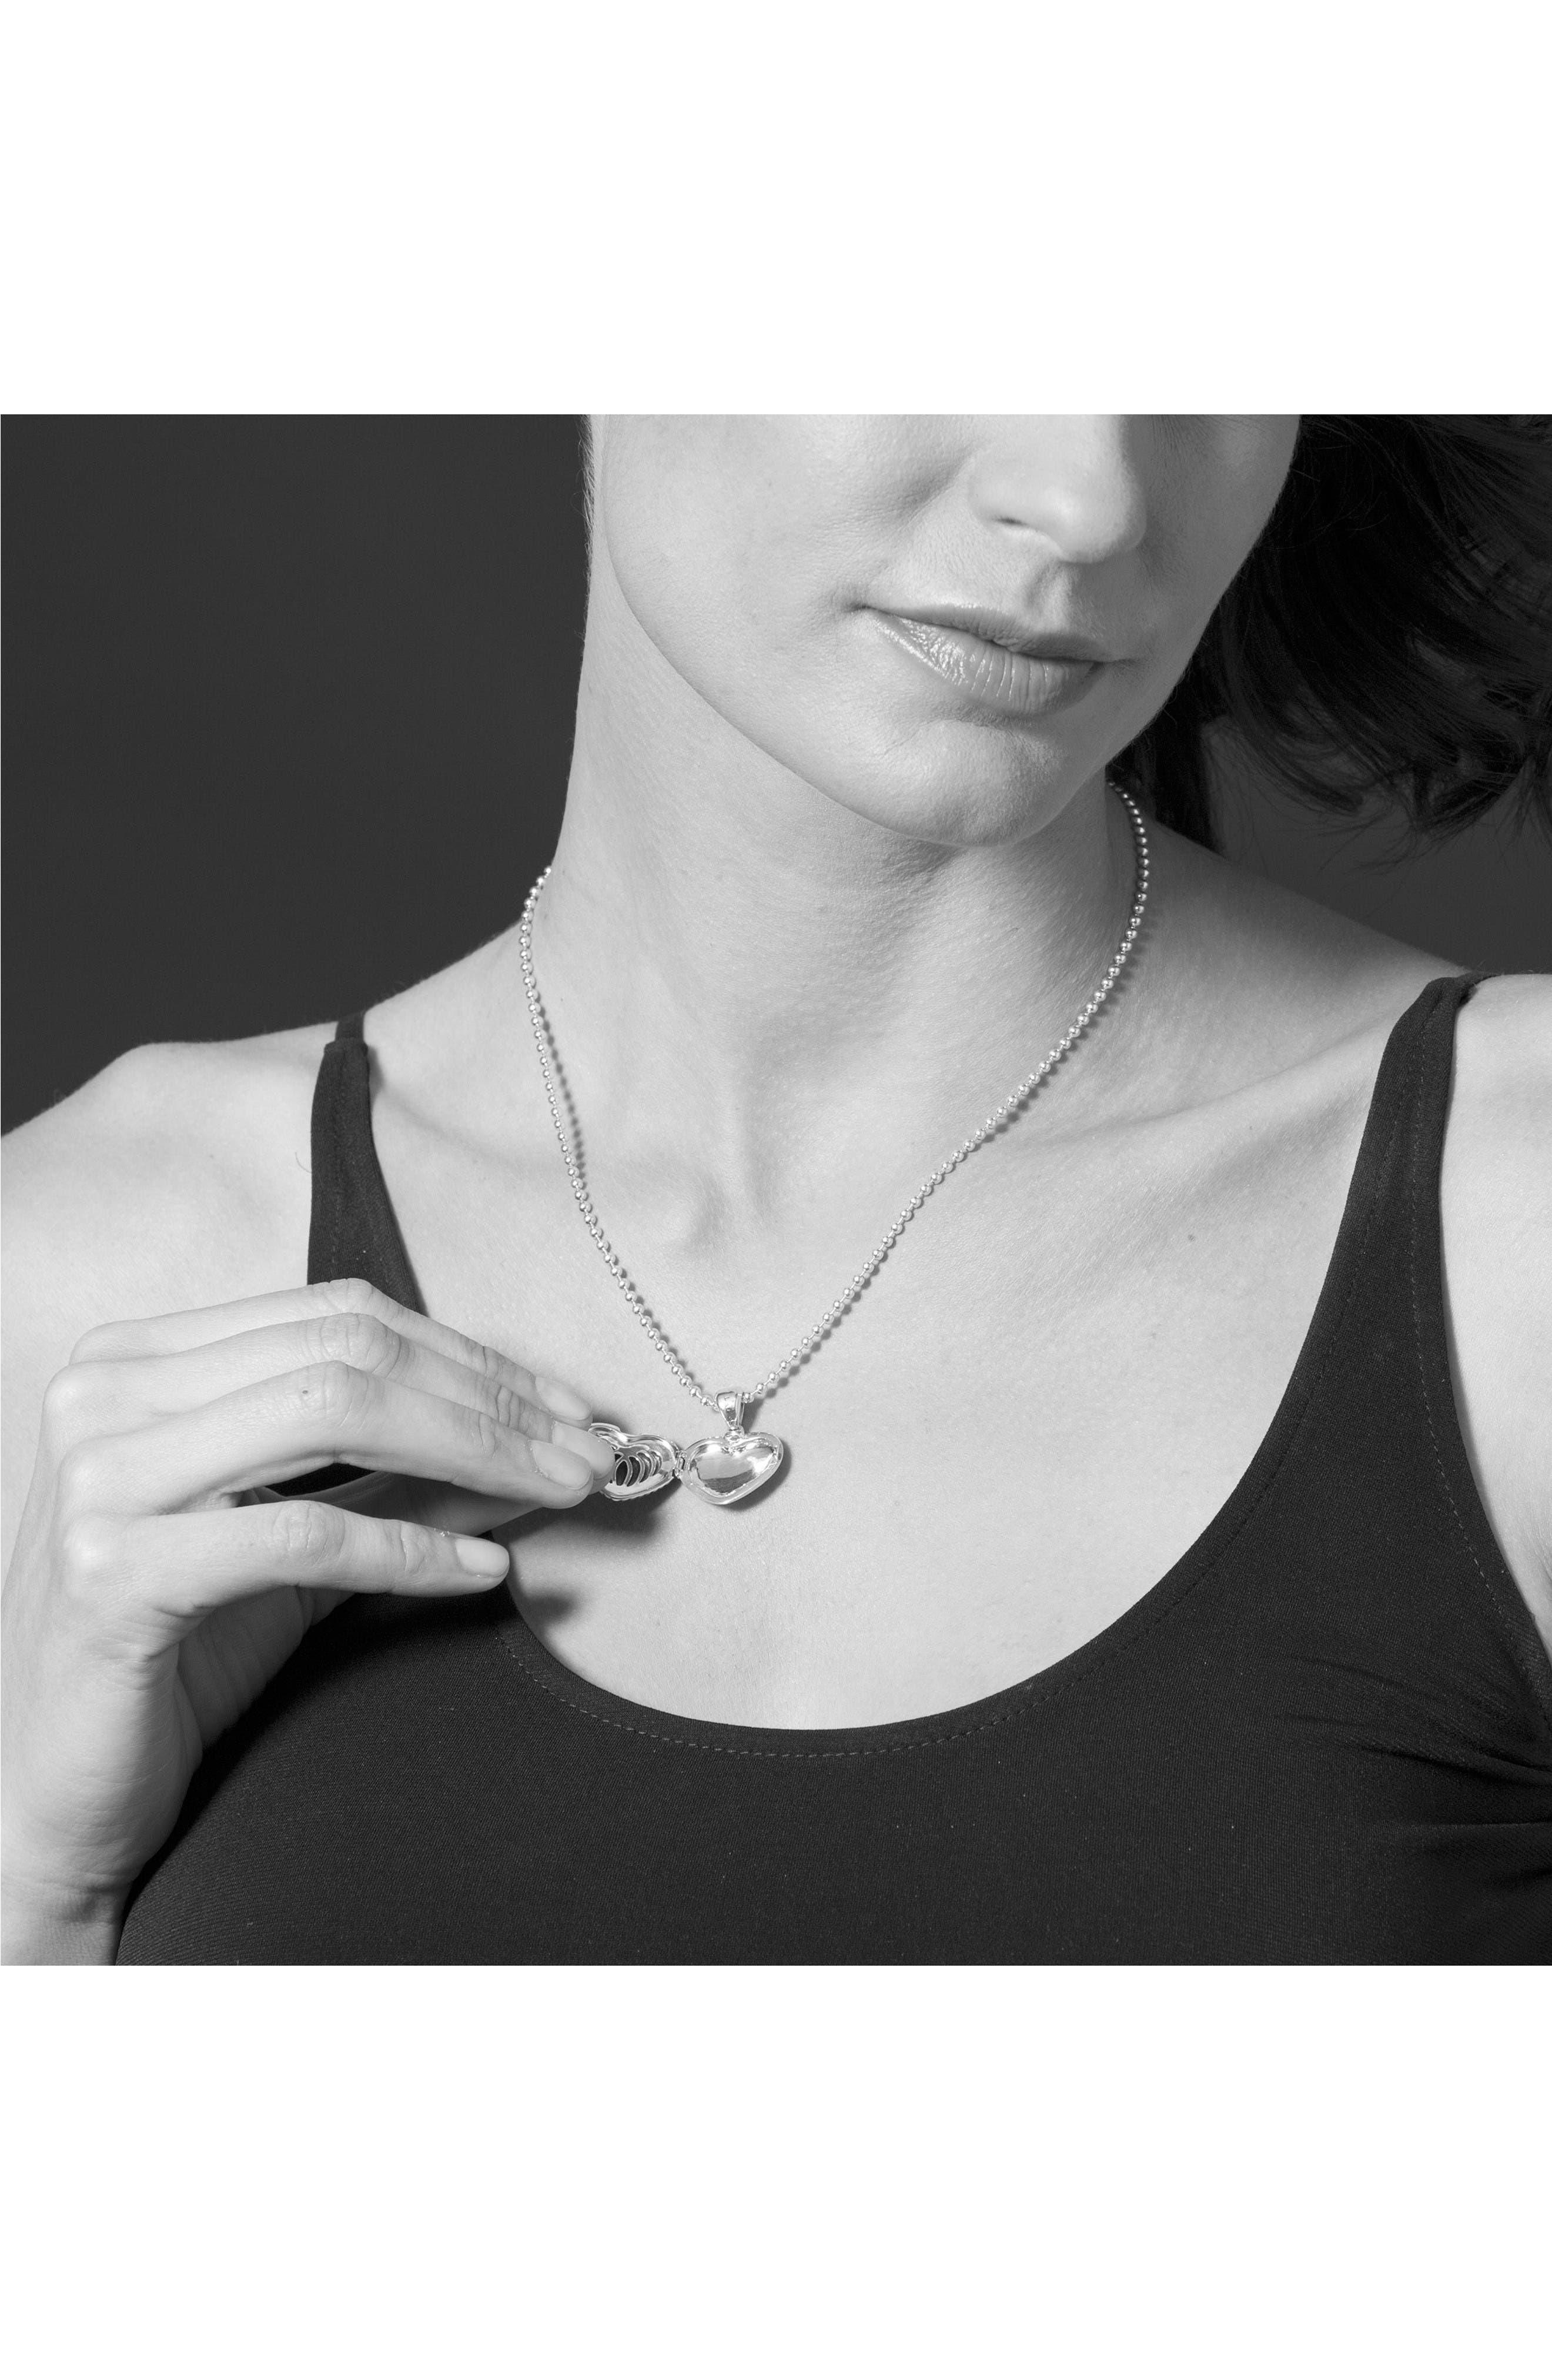 Beloved Fluted Heart Locket Necklace,                             Alternate thumbnail 2, color,                             Silver